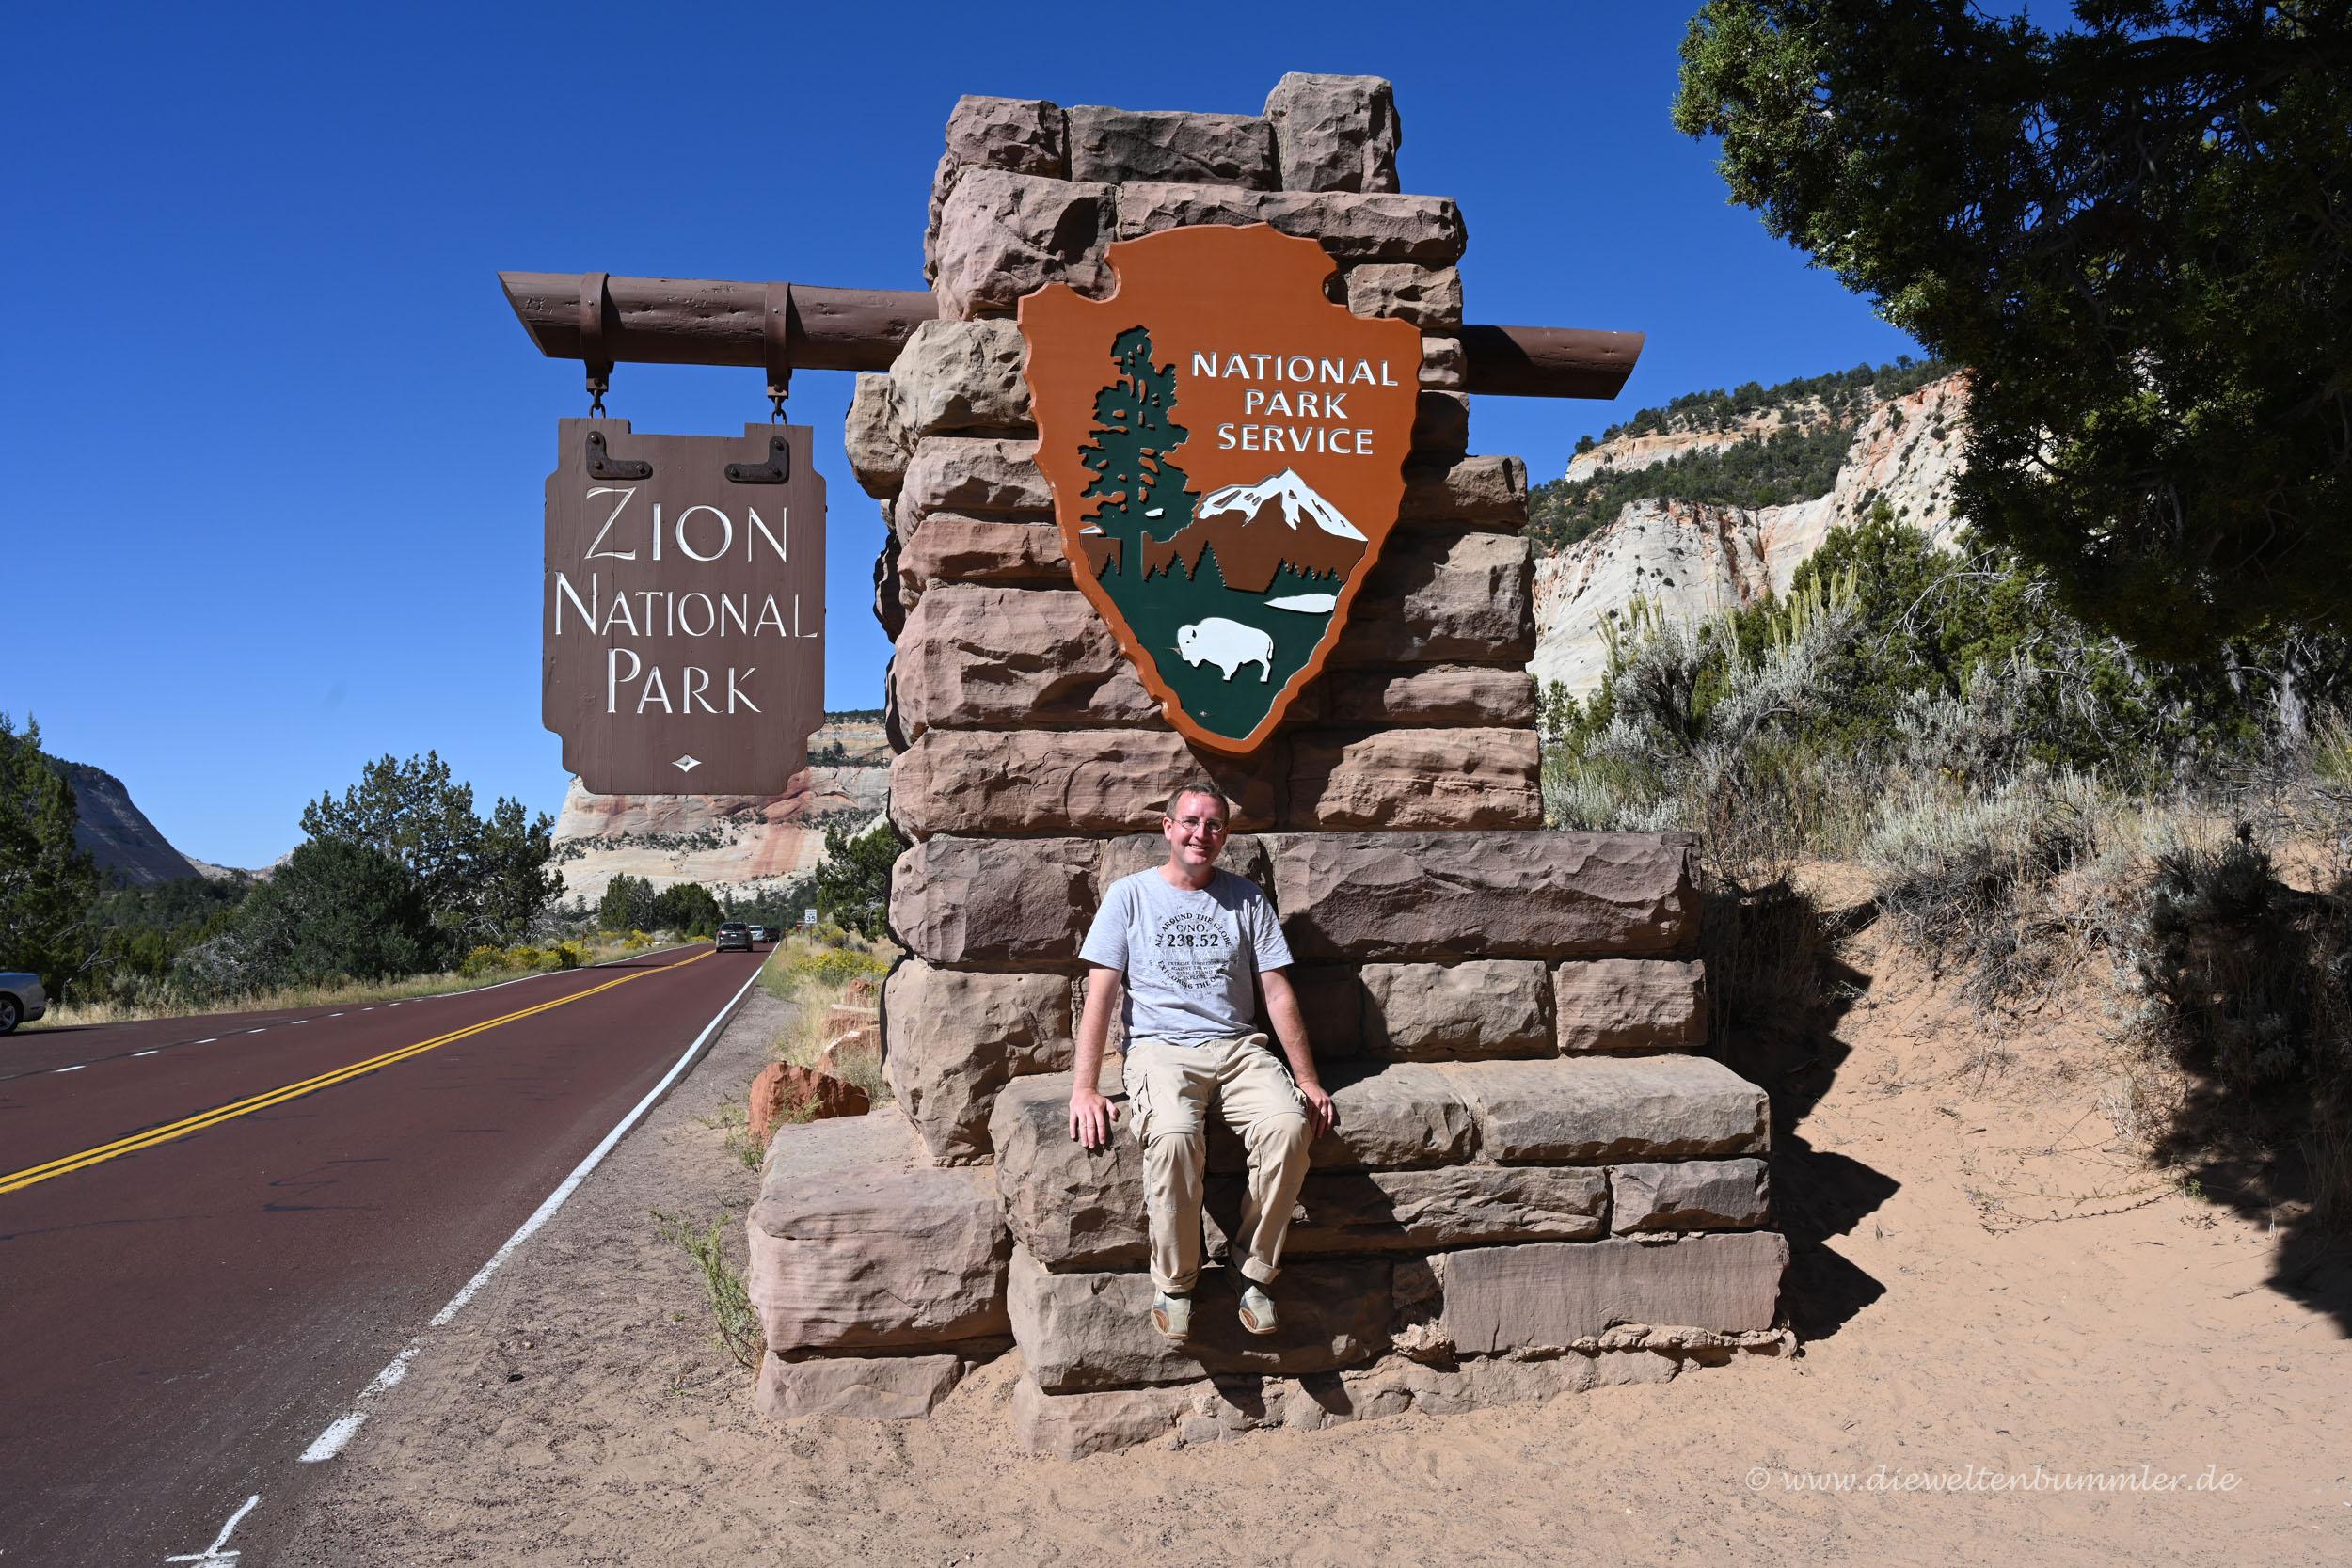 Michael Moll am Zion Nationalpark